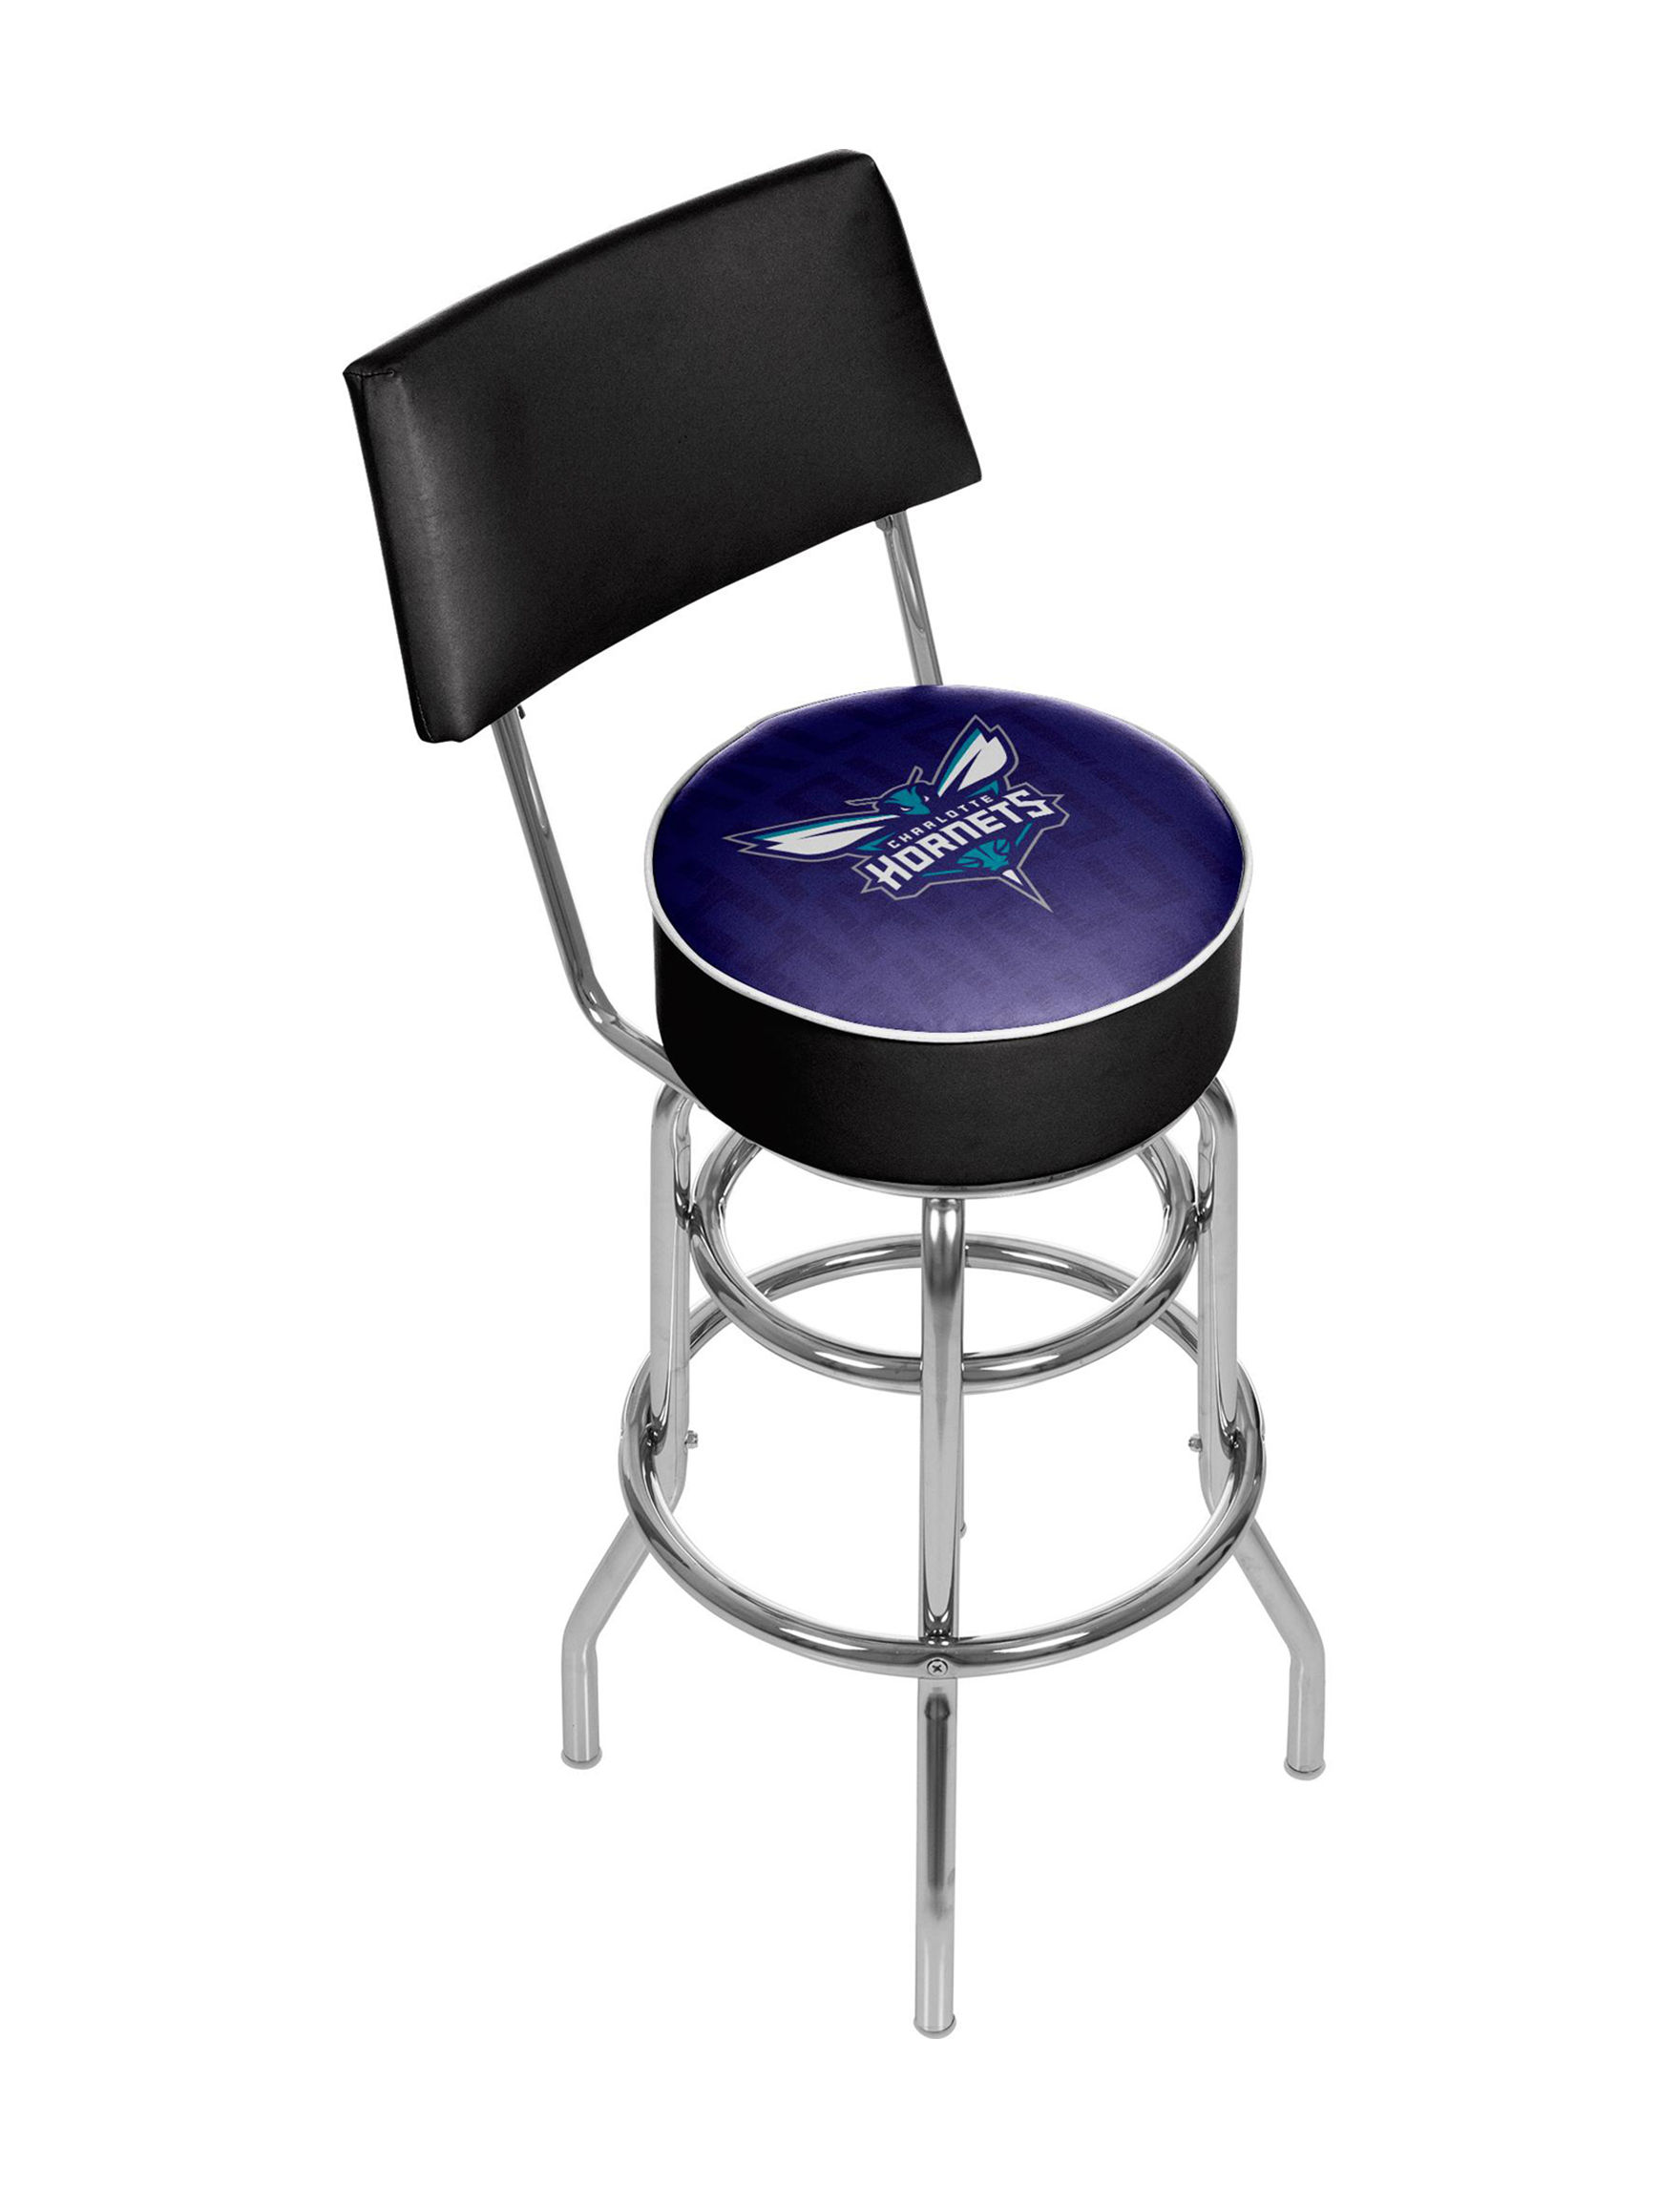 Trademark Global Purple / Teal Bar & Kitchen Stools Kitchen & Dining Furniture